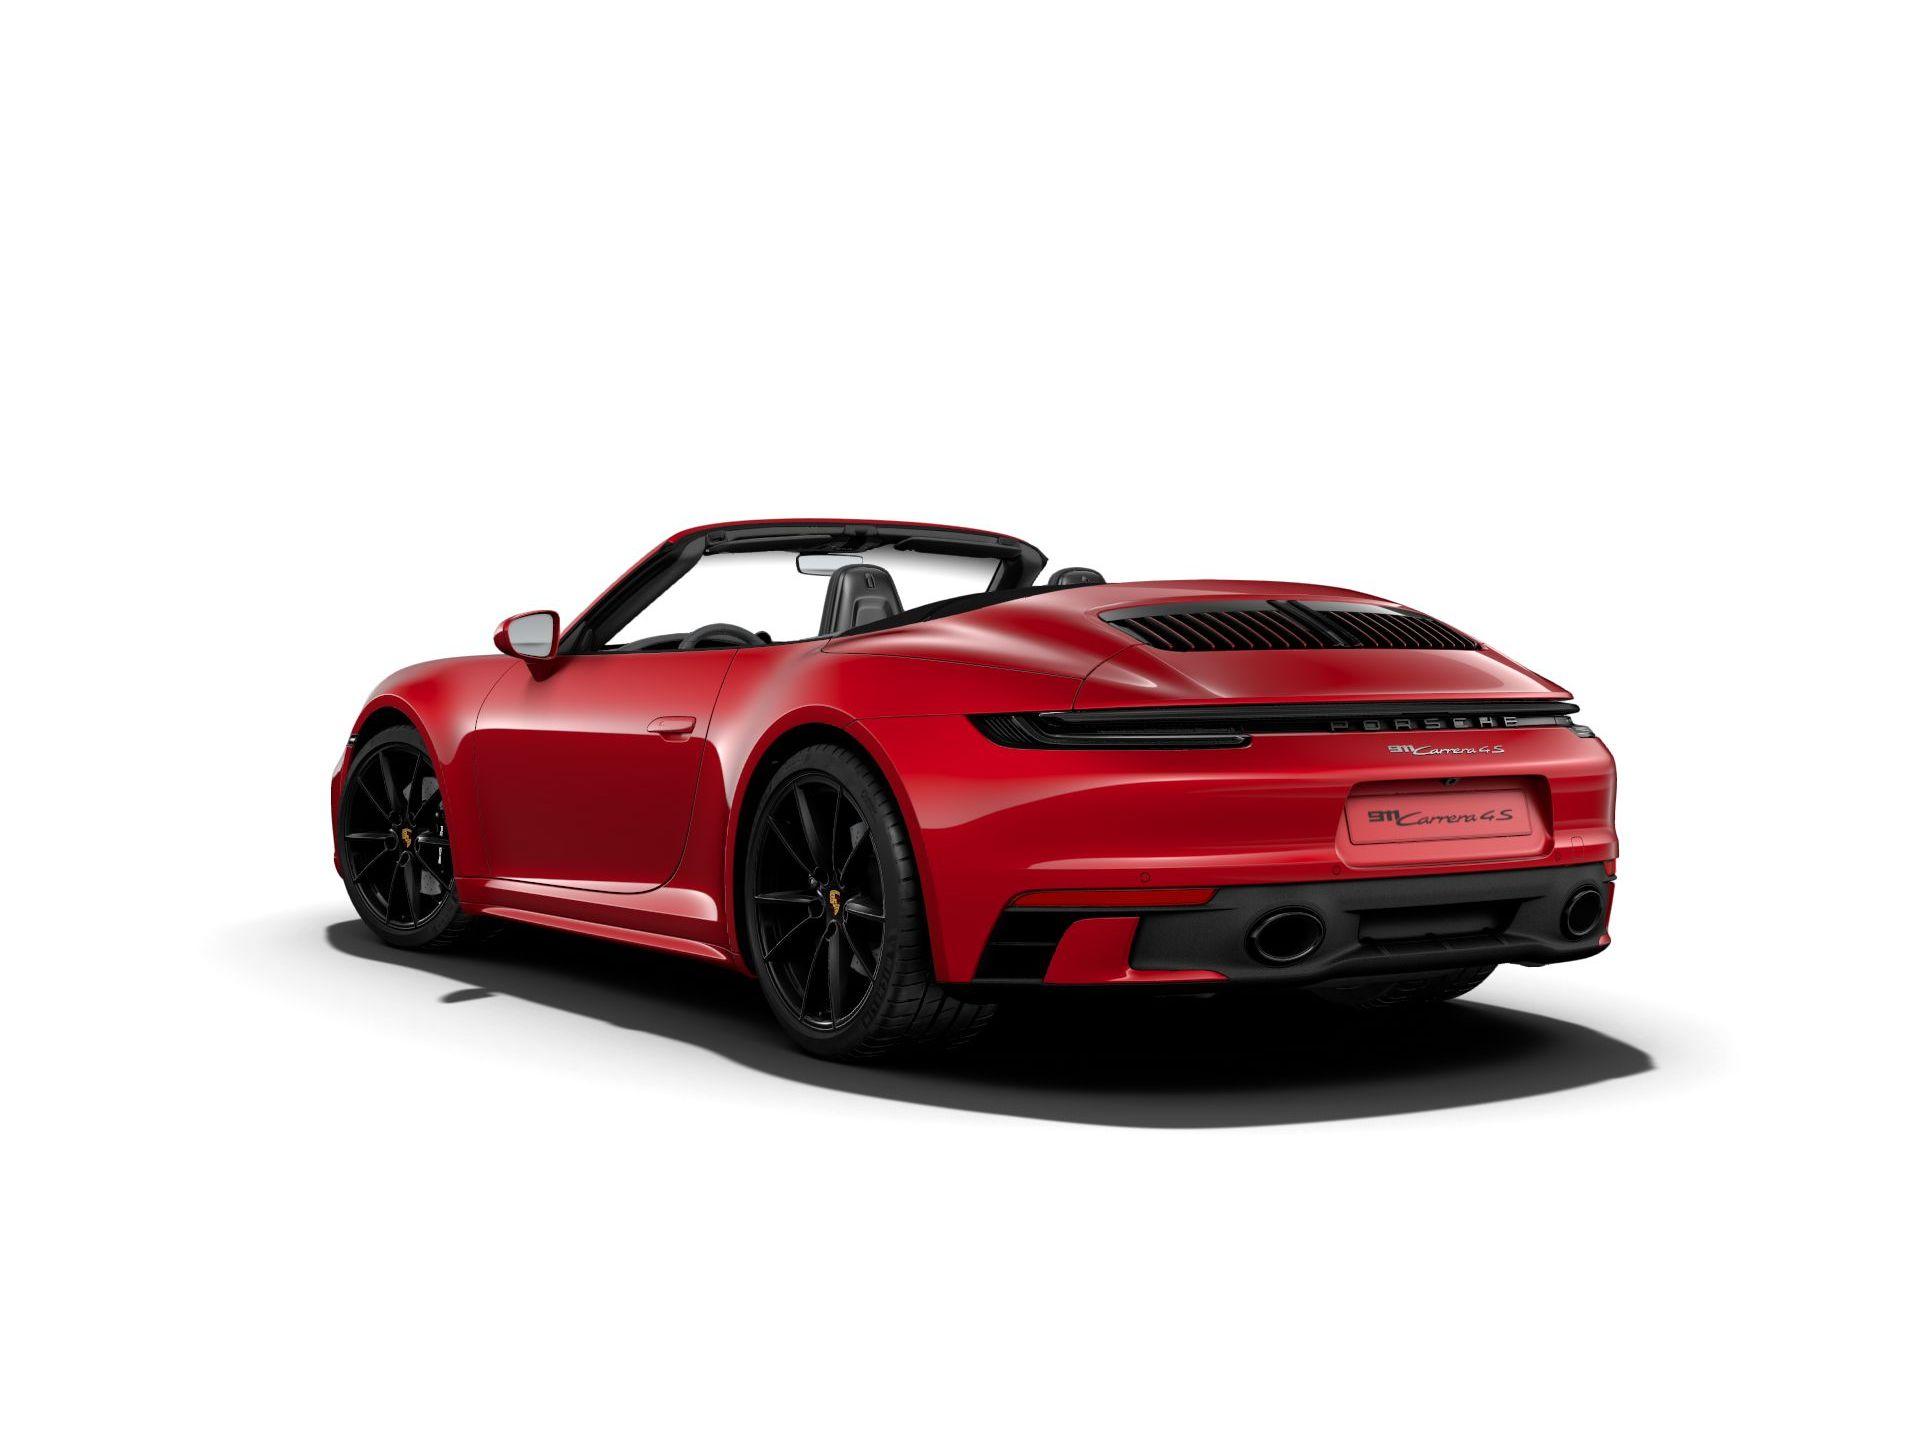 2021 Porsche 911 Carrera 4S Cabriolet – 3